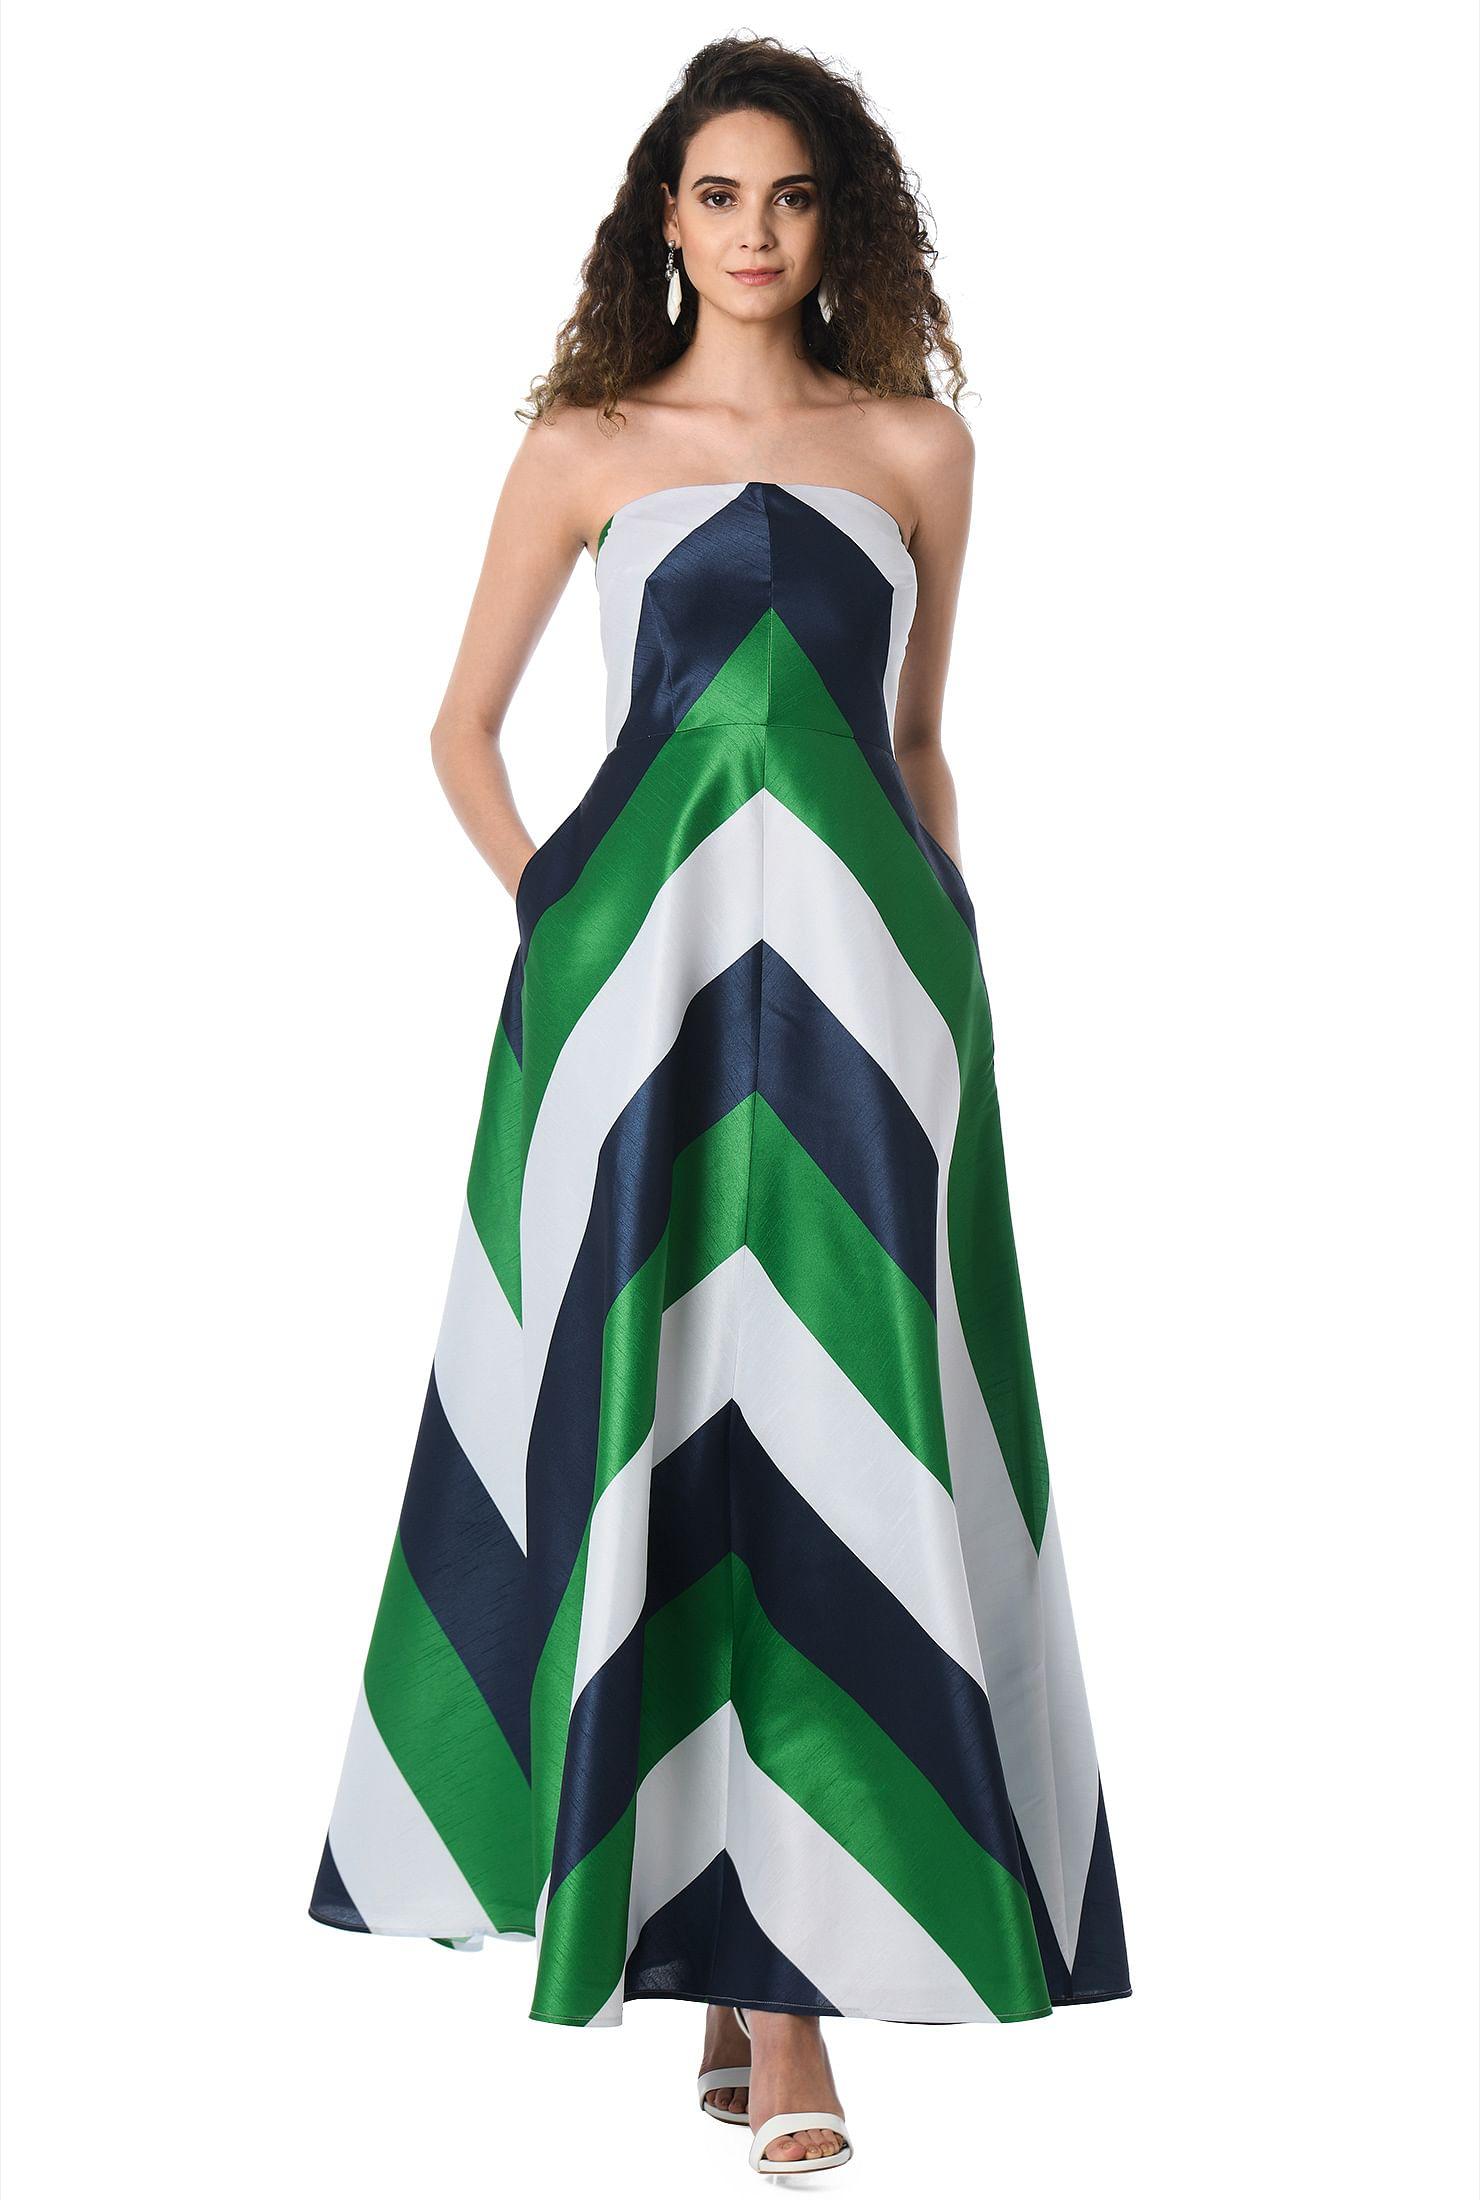 d935ca209cbc black/navy/green dresses, Colorblock Dresses, feminine dresses, full length